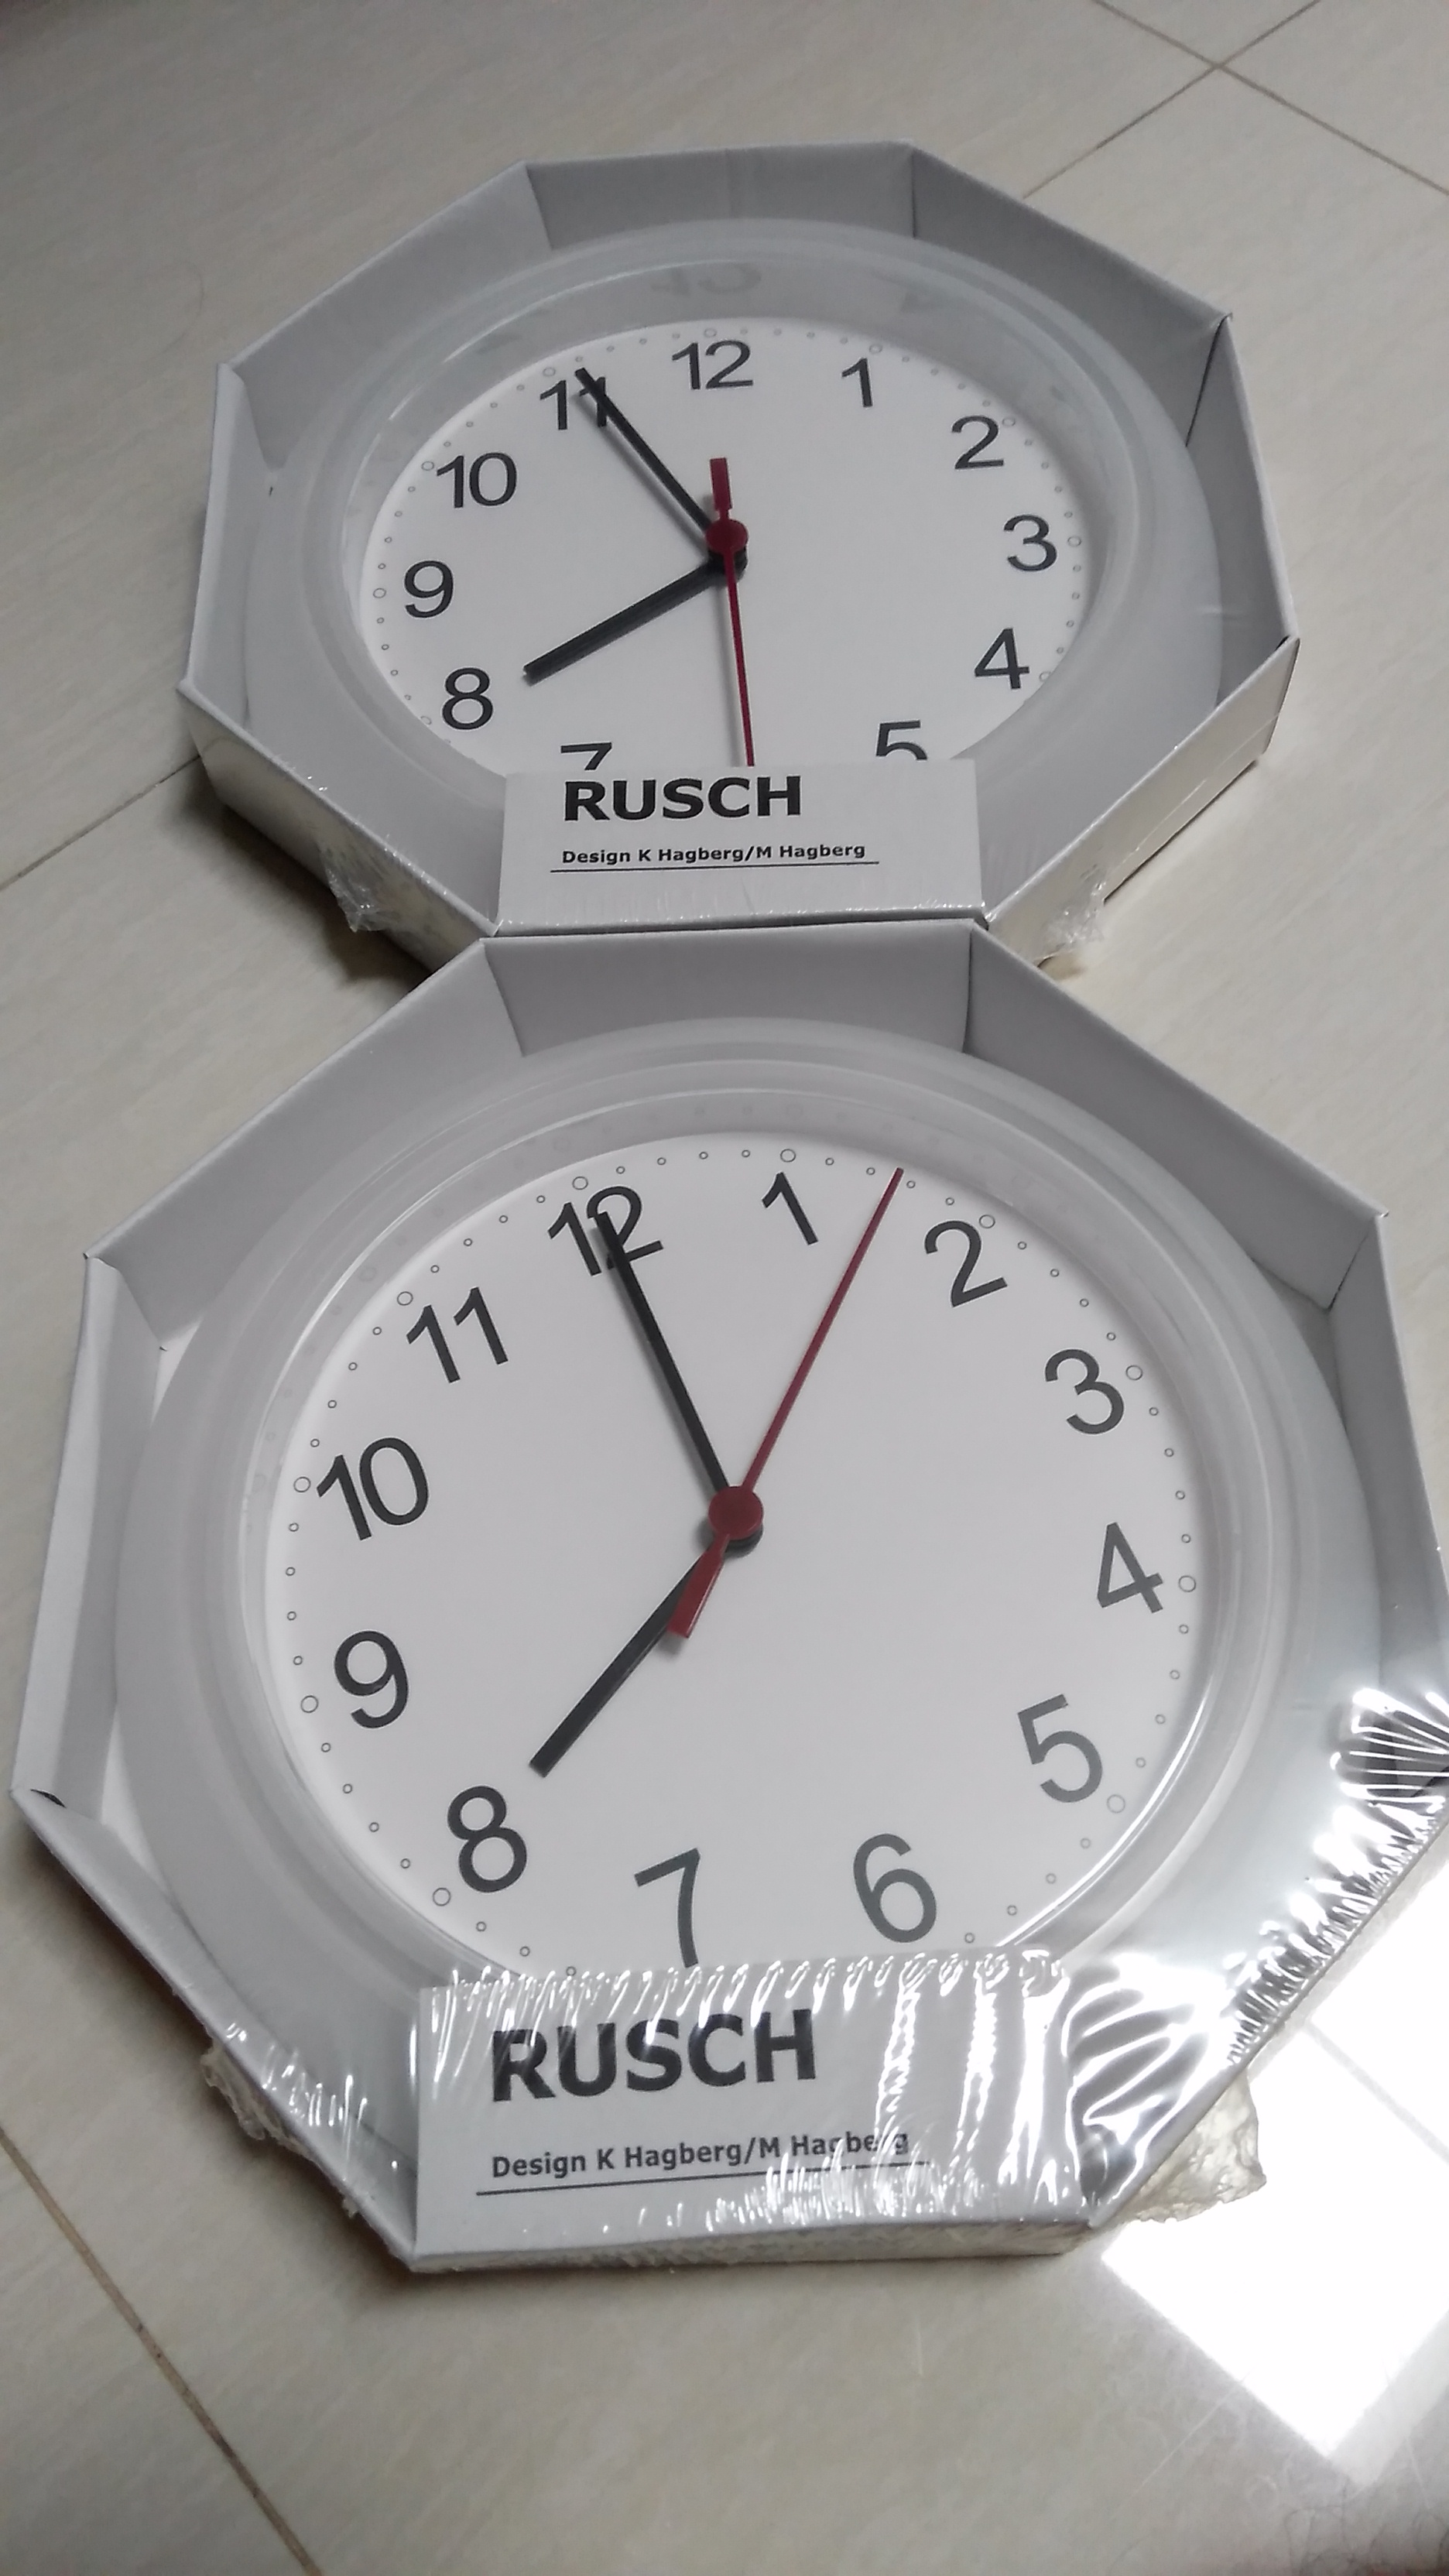 Ikea Rusch Jam Dinding Clock Wall Putih Daftar Vackis Beker Best Seller By Jual Wakakaka